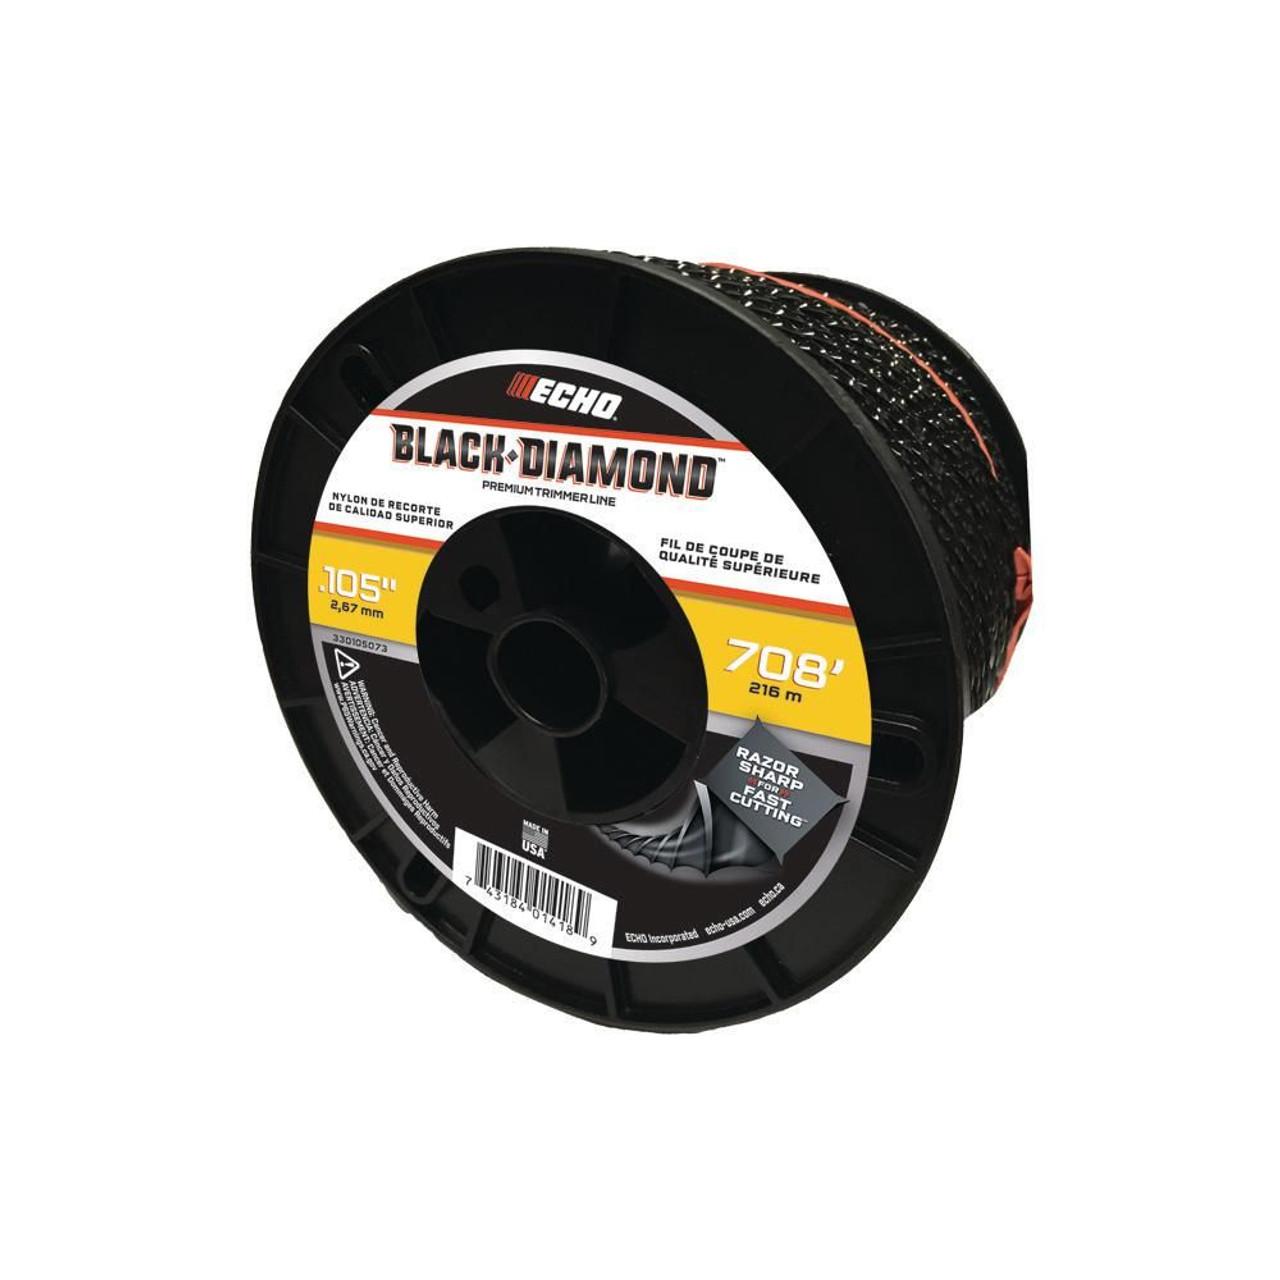 Echo Srm, Gt, .105 Black Diamond Trimmer Line 708 Feet 3lb spool, Professional Grade 330105073